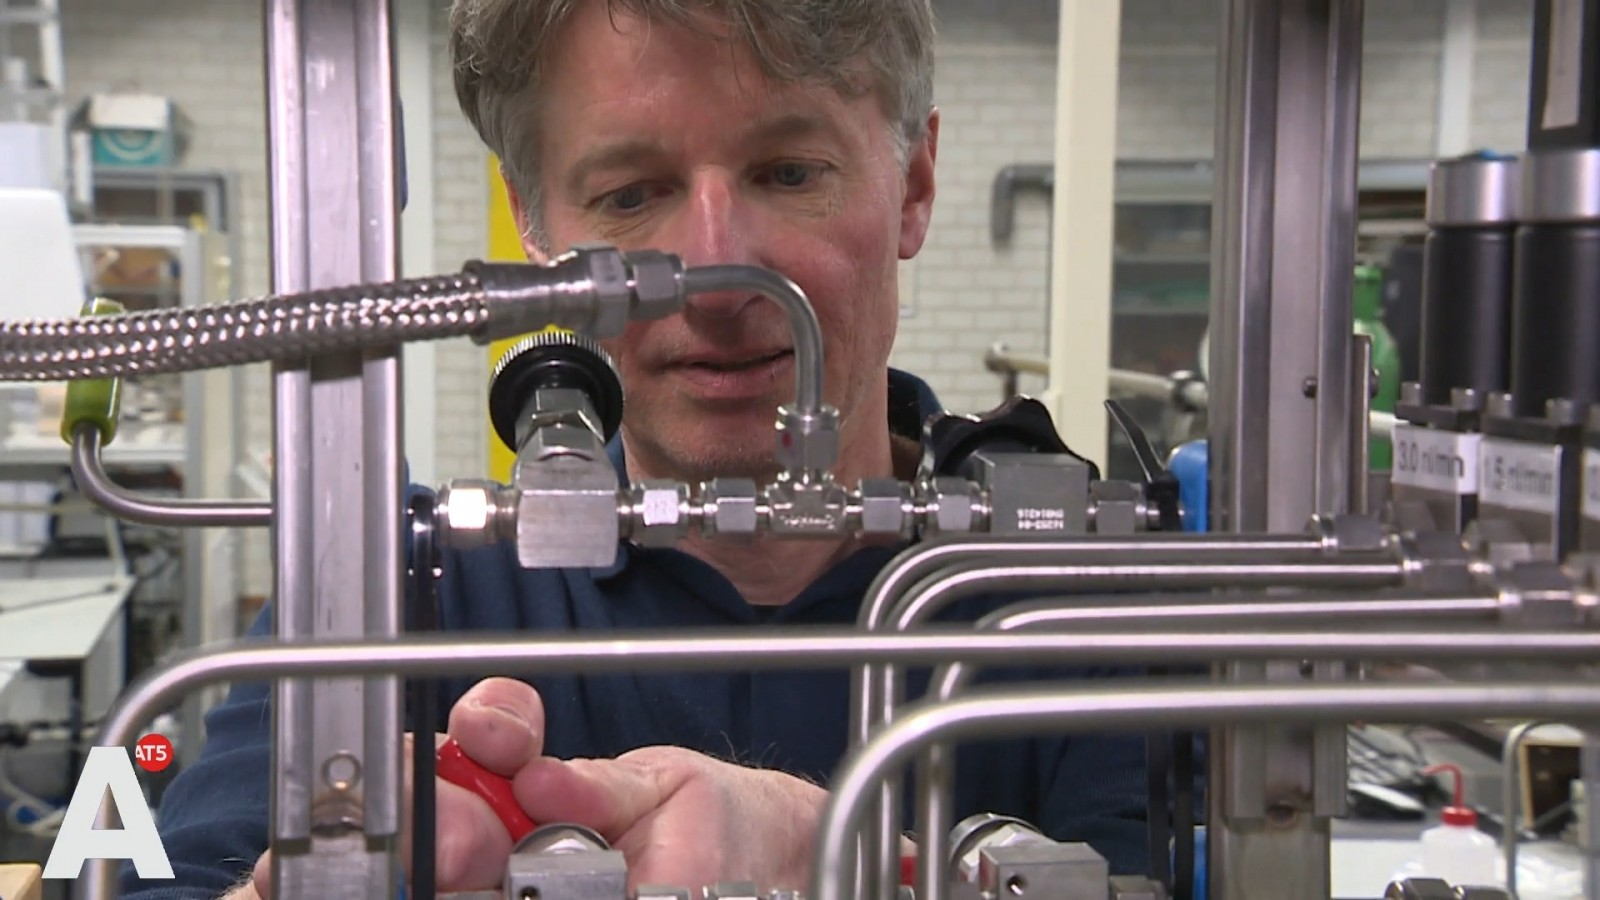 David Smeulders, hoogleraar Energiesystemen